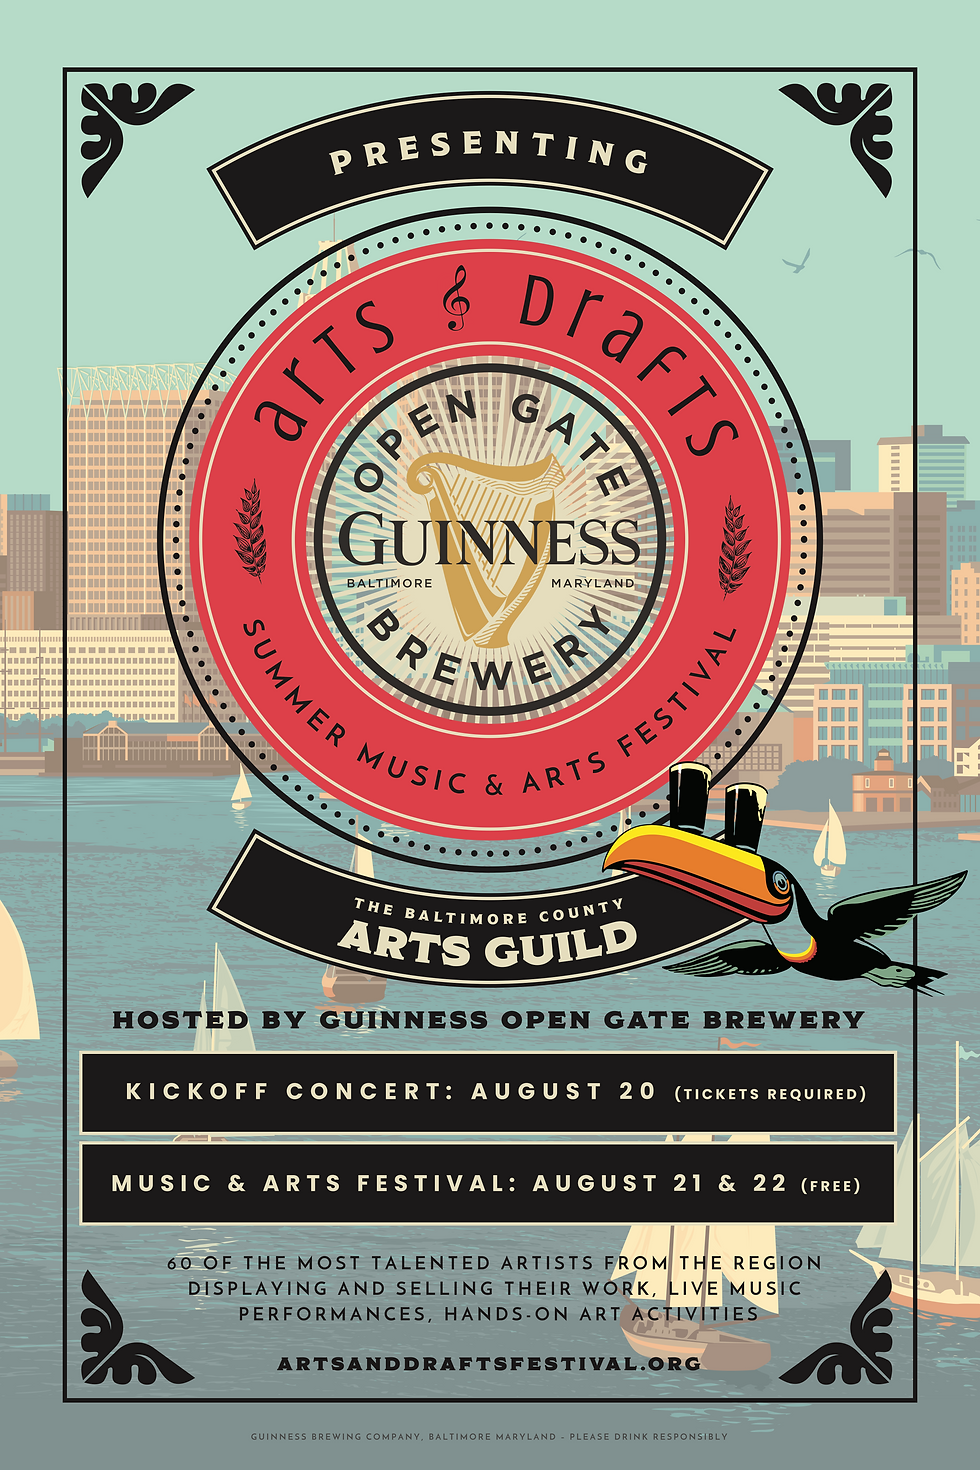 Guinness-ArtsandDrafts-24x36-Outlined.png